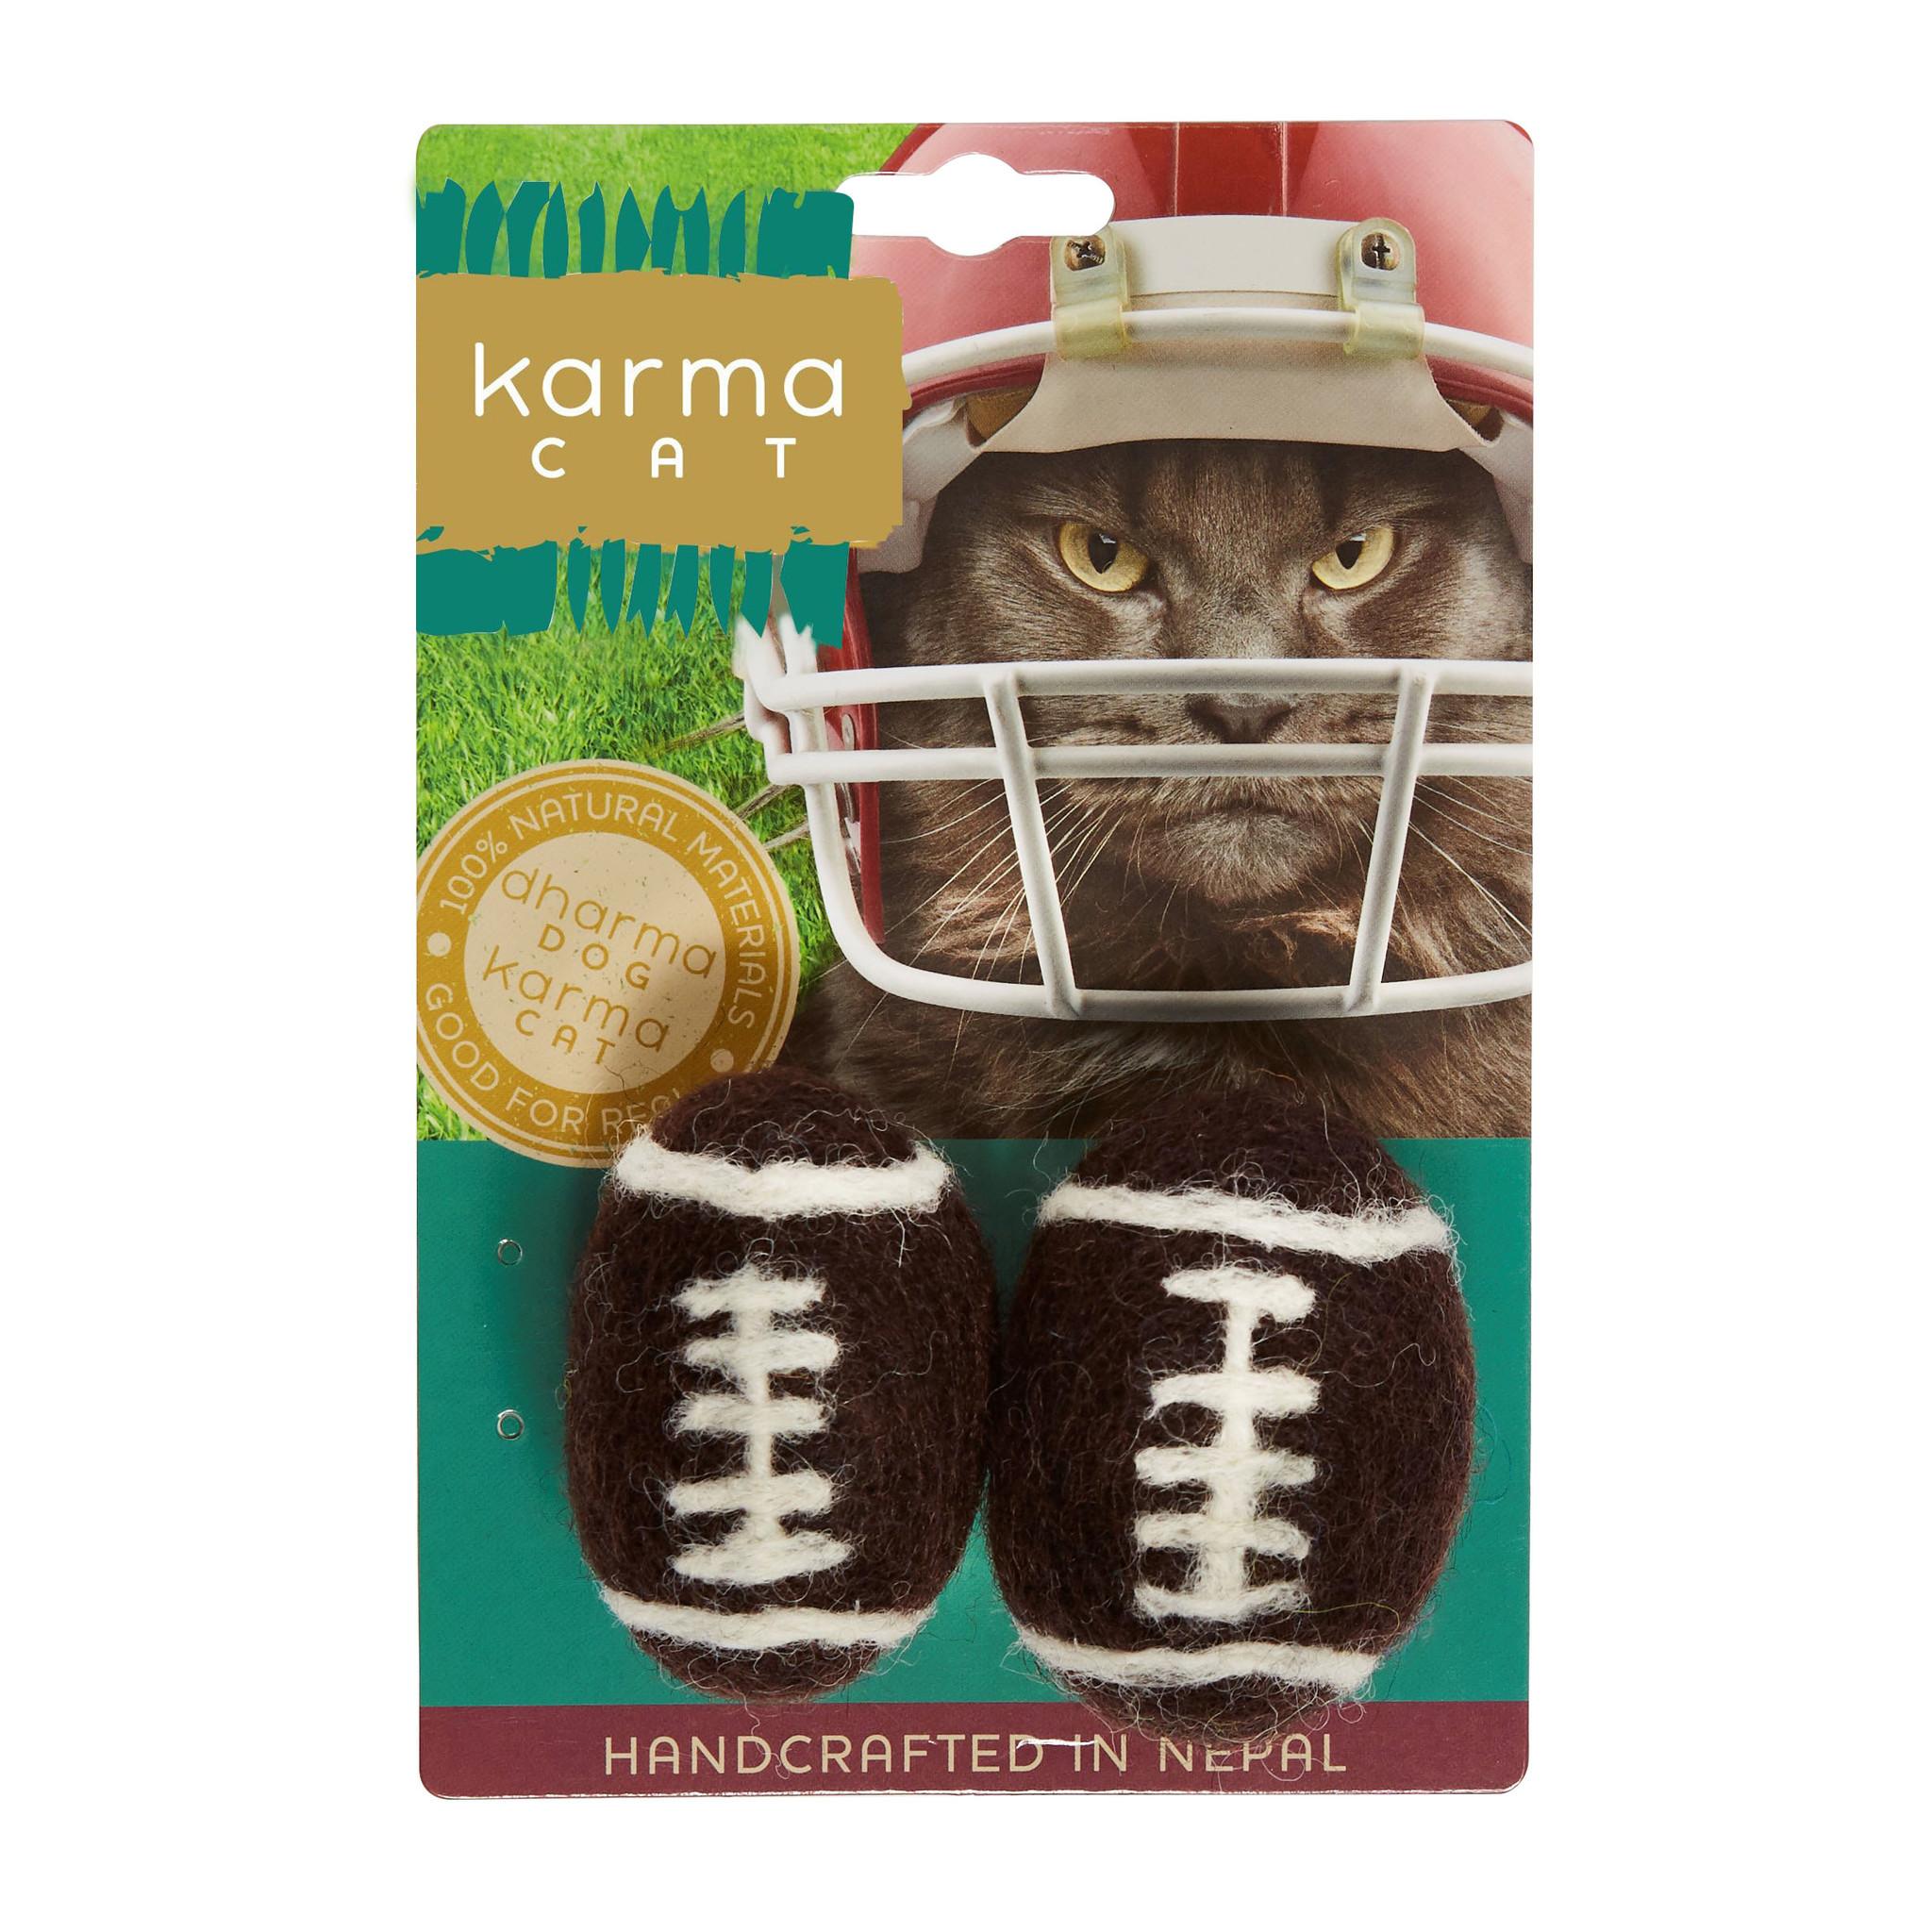 Karma Cat Karma Cat - Felt Football 2 pk